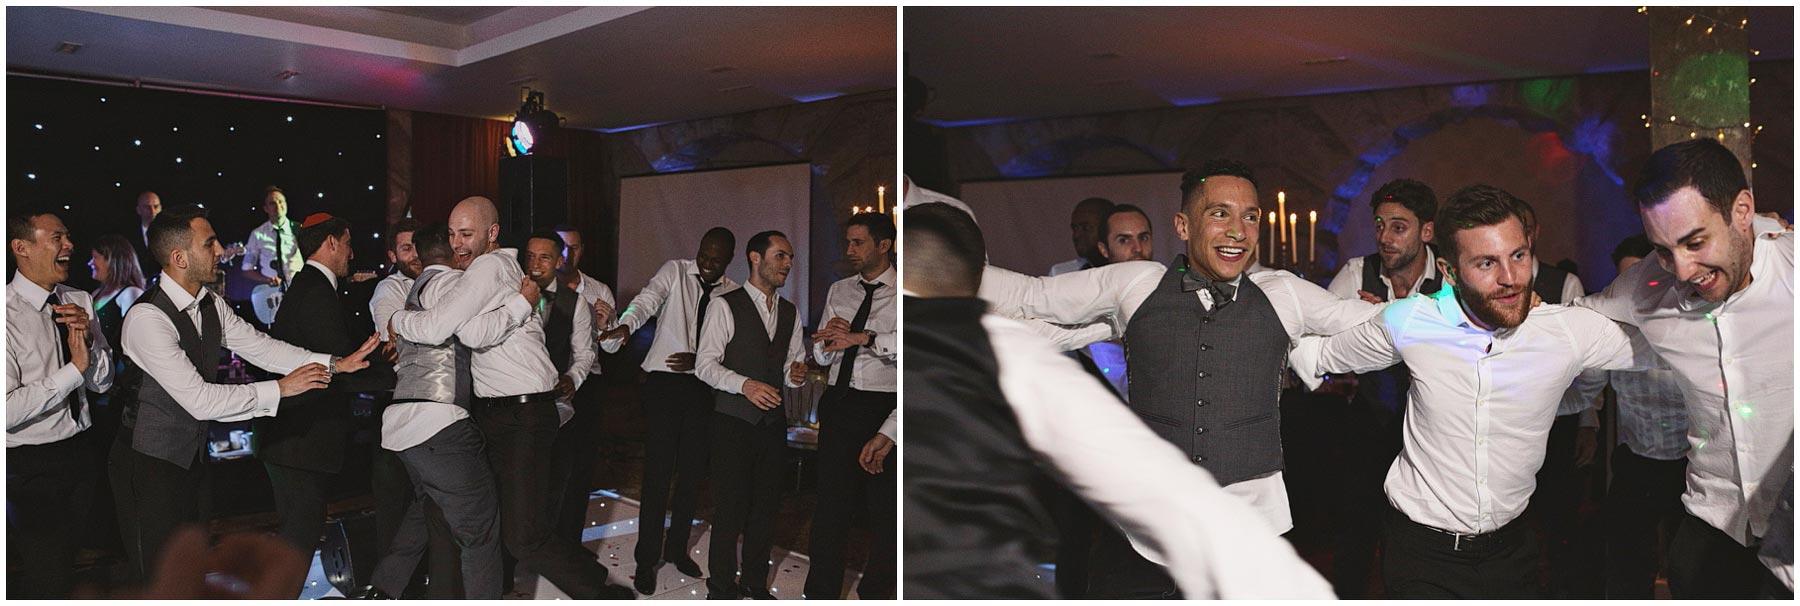 Jewish-Wedding-Photography_0122